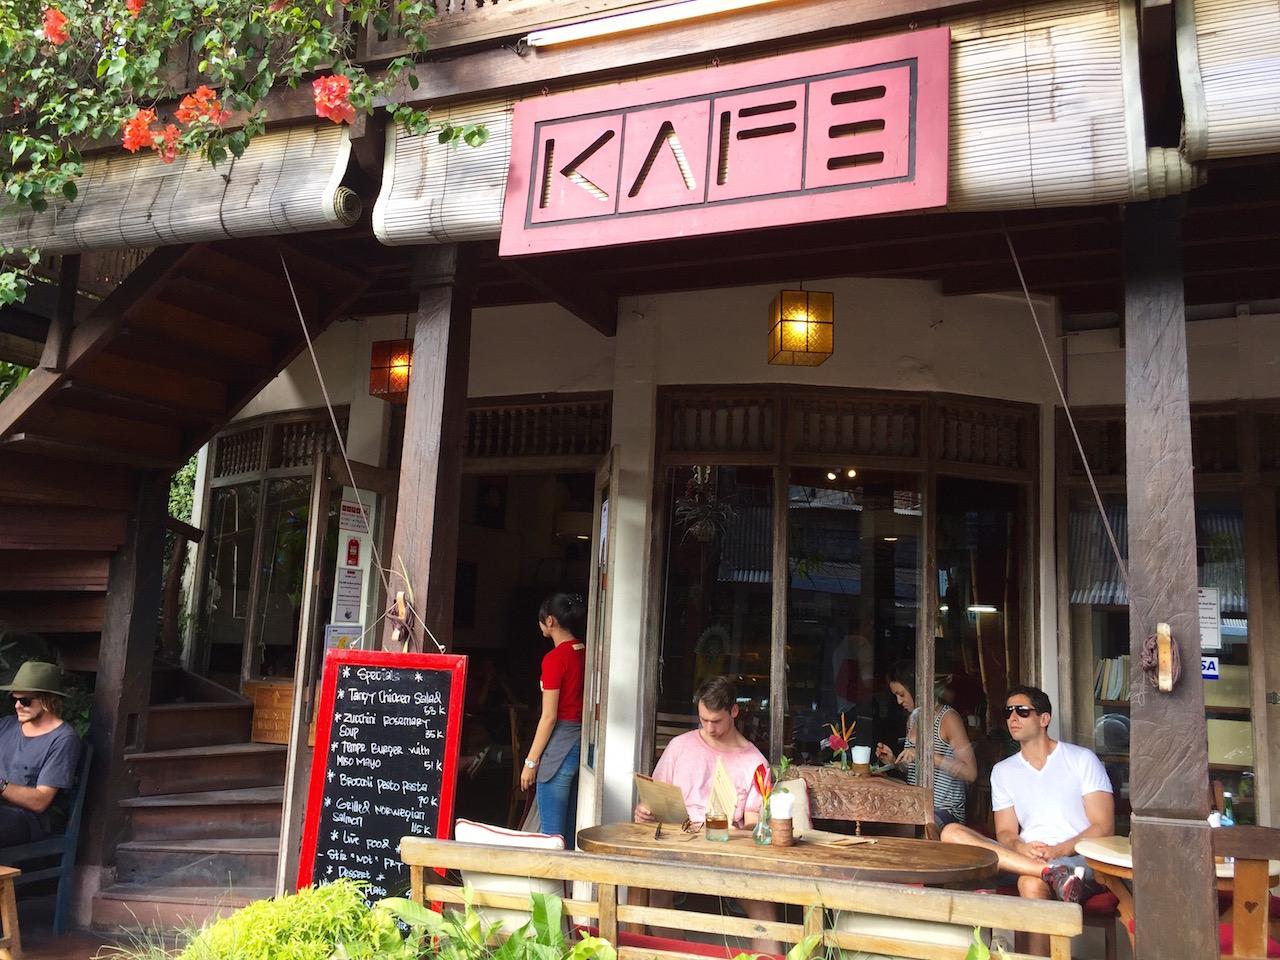 kafe-restaurant-ubud-bali